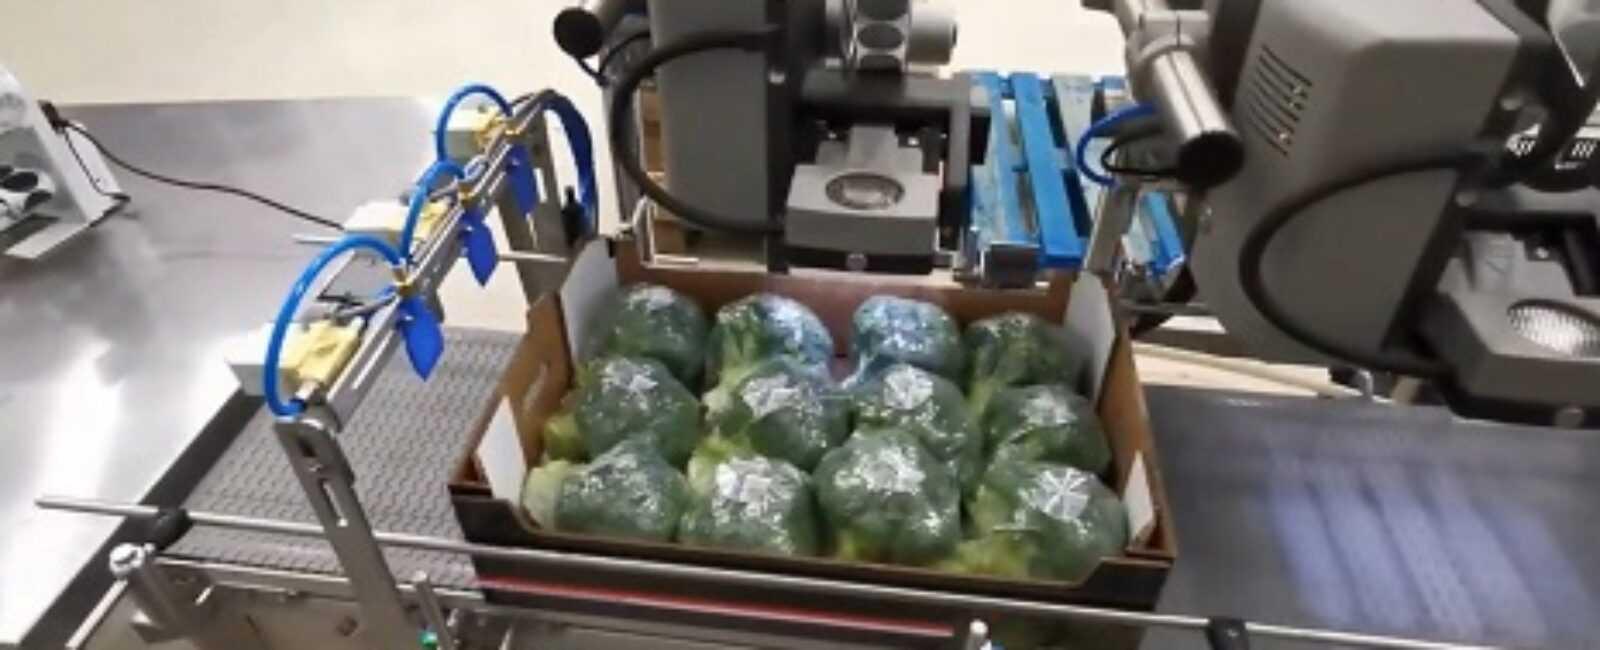 groenten etiketteren